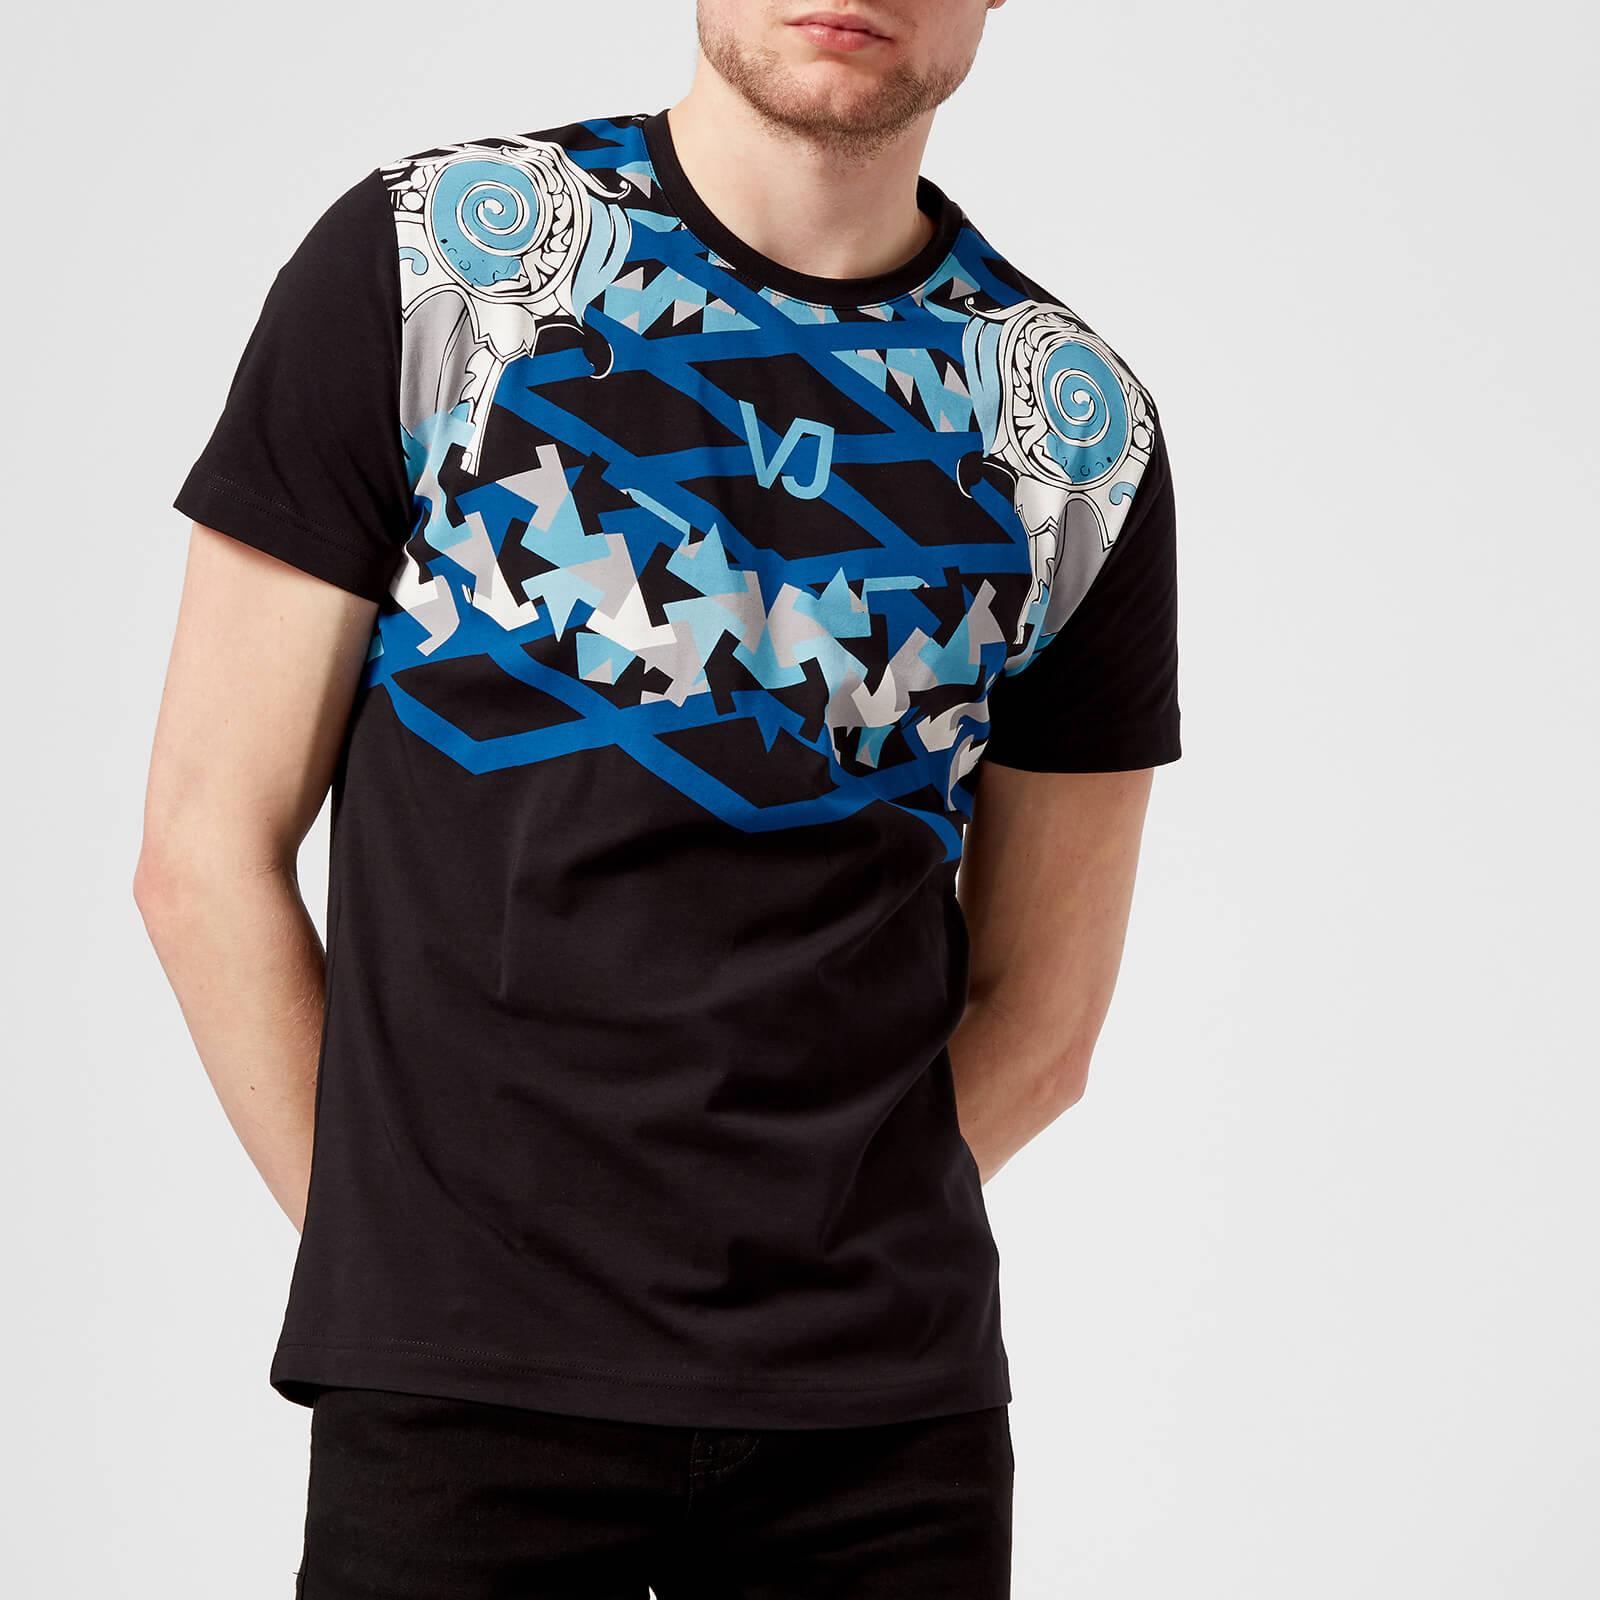 0bfa6d18 Versace Jeans Men's Neck Print T-Shirt - Nero Clothing | TheHut.com